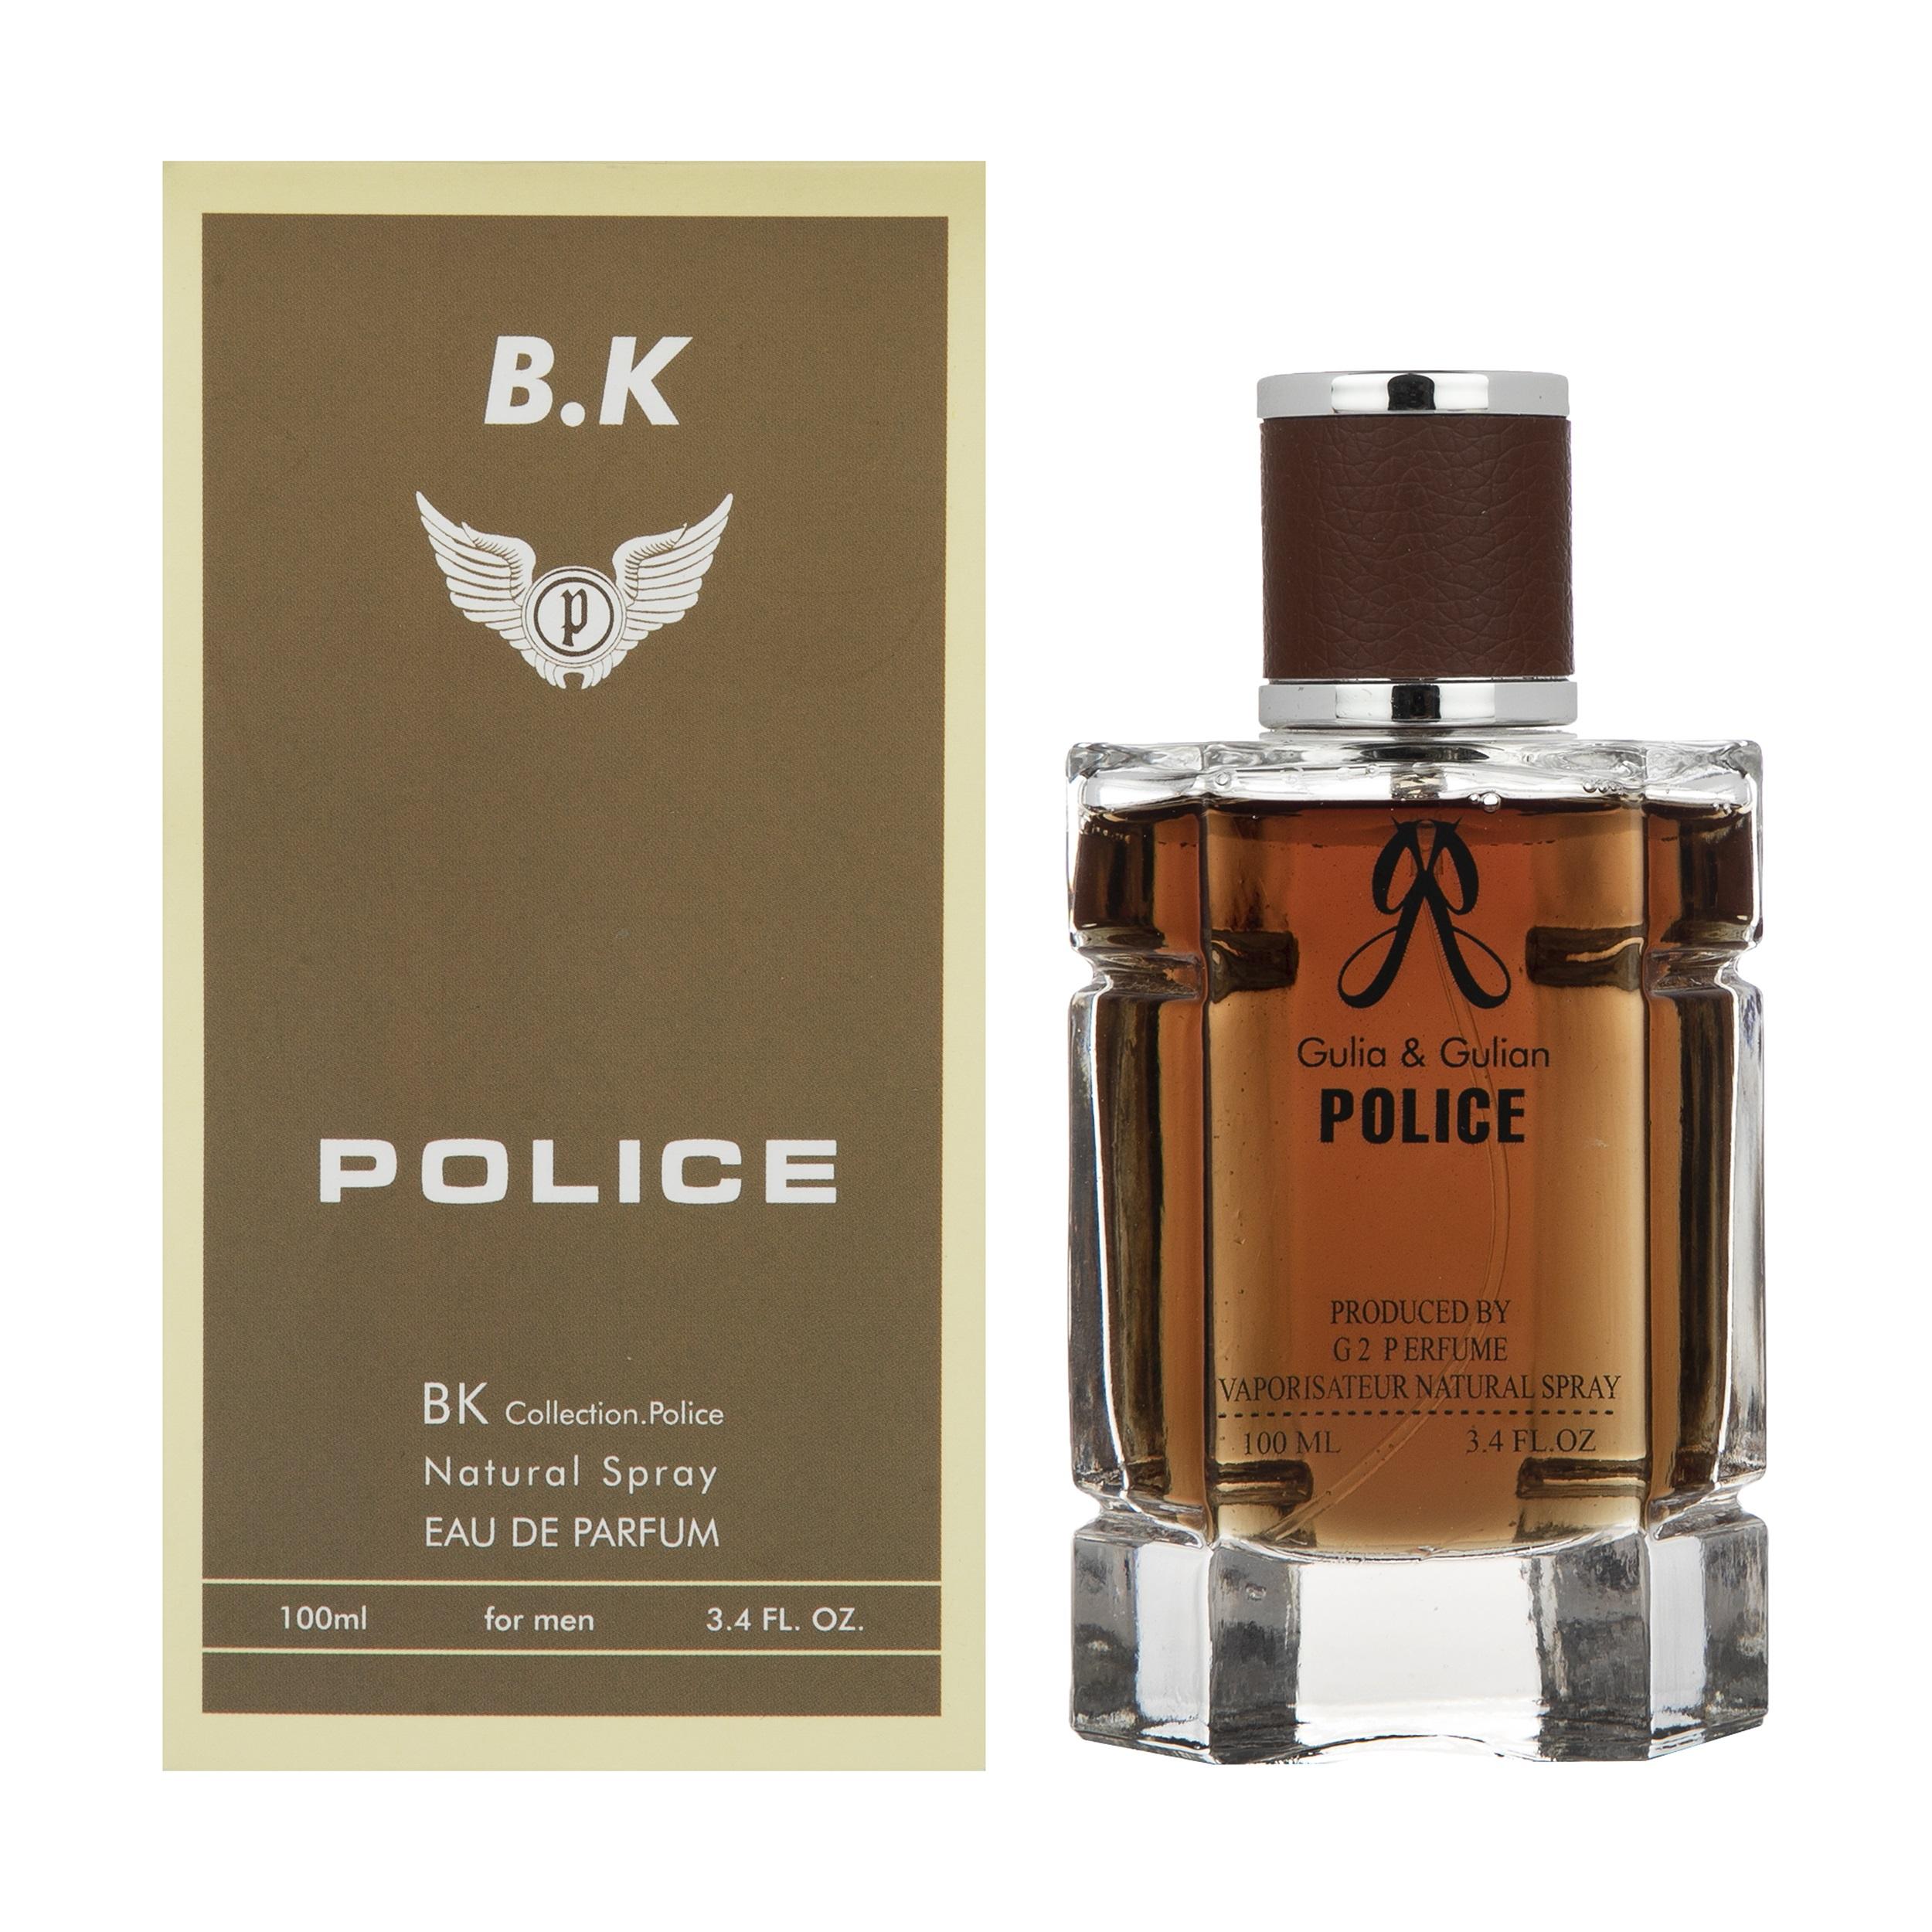 ادو پرفیوم مردانه بی کی مدل Police حجم ۱۰۰ میلی لیتر